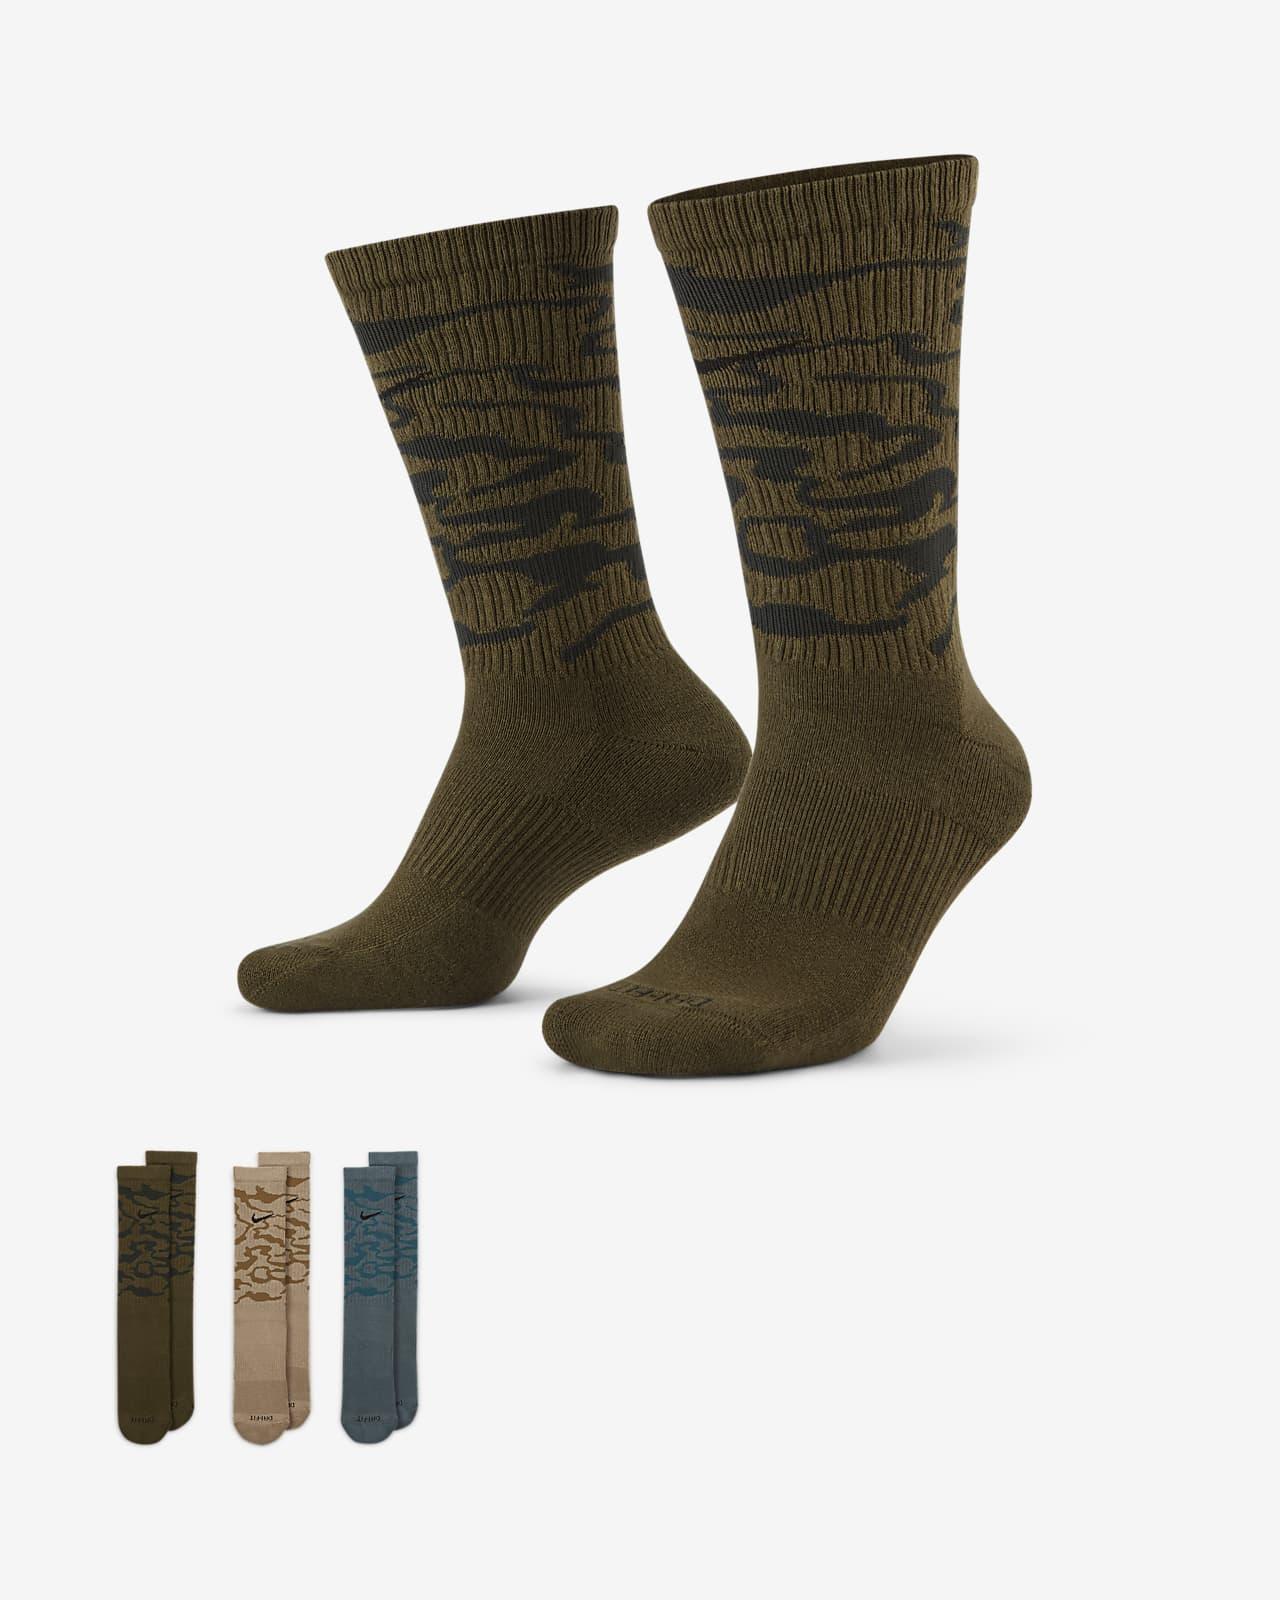 Nike Everyday Plus Cushioned Training Crew Socks (3 Pairs)